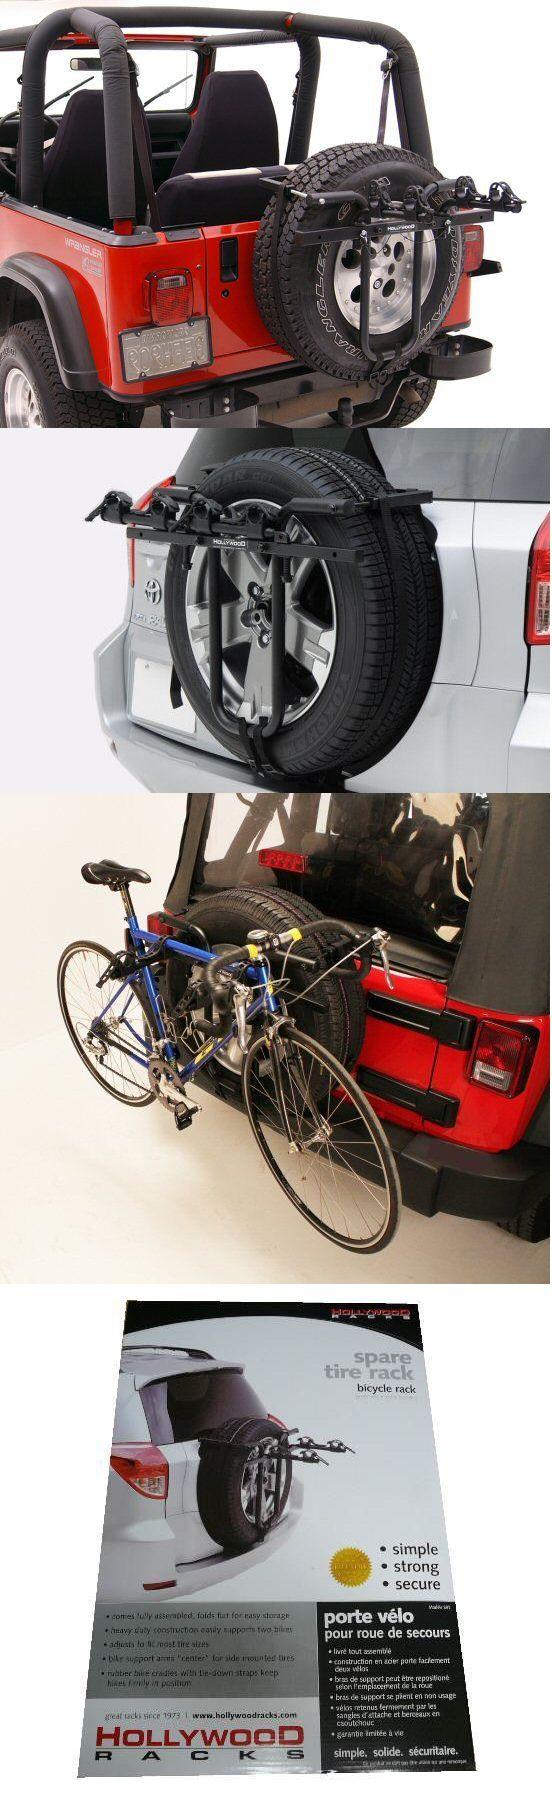 17 Best ideas about Spare Tire Bike Rack on Pinterest